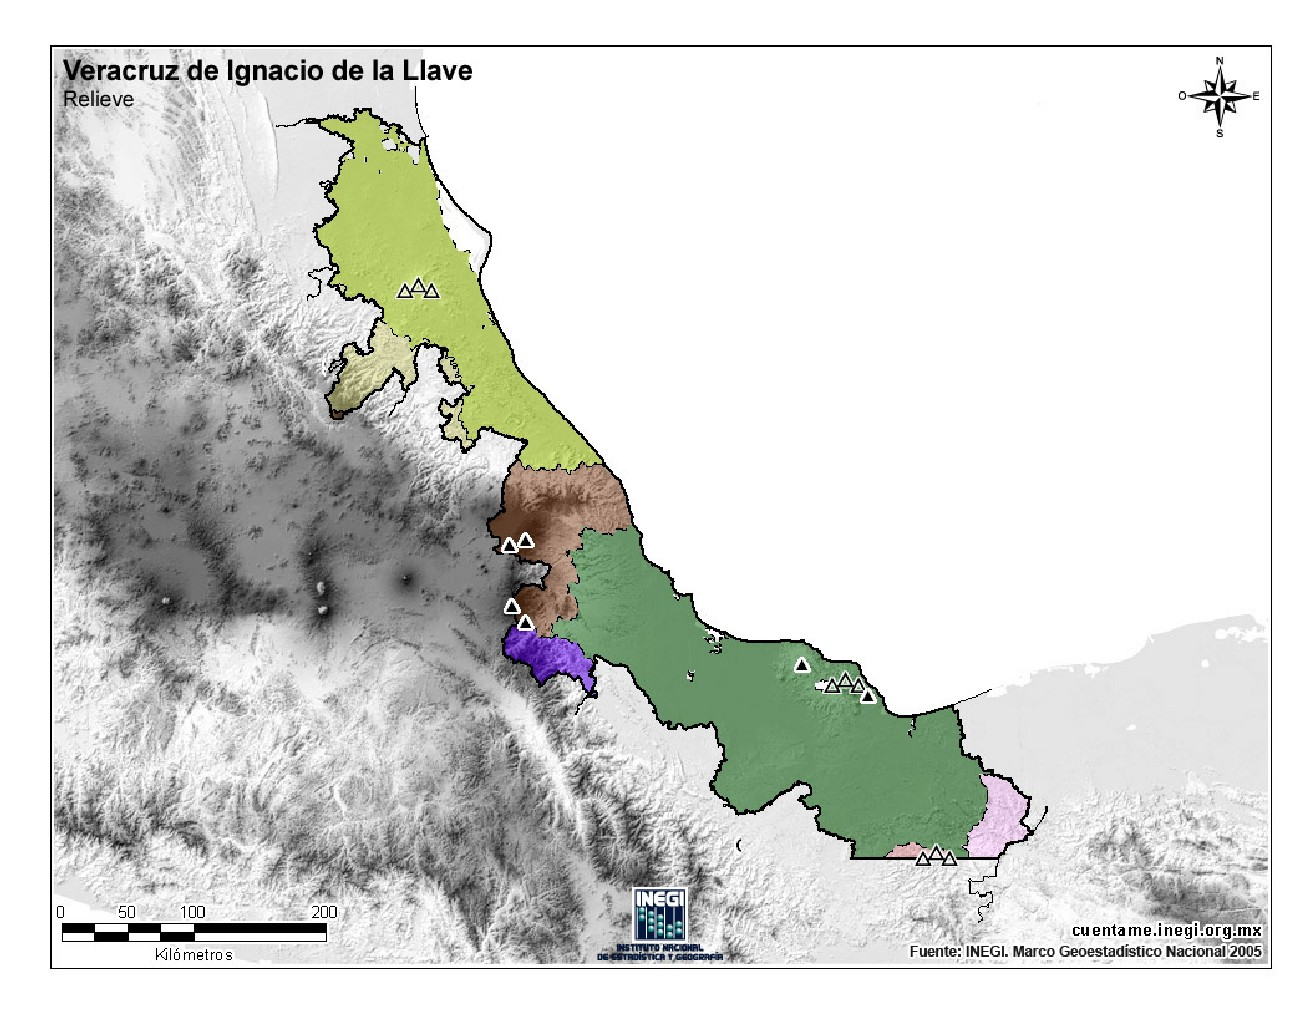 Mapa mudo de montañas de Veracruz. INEGI de México